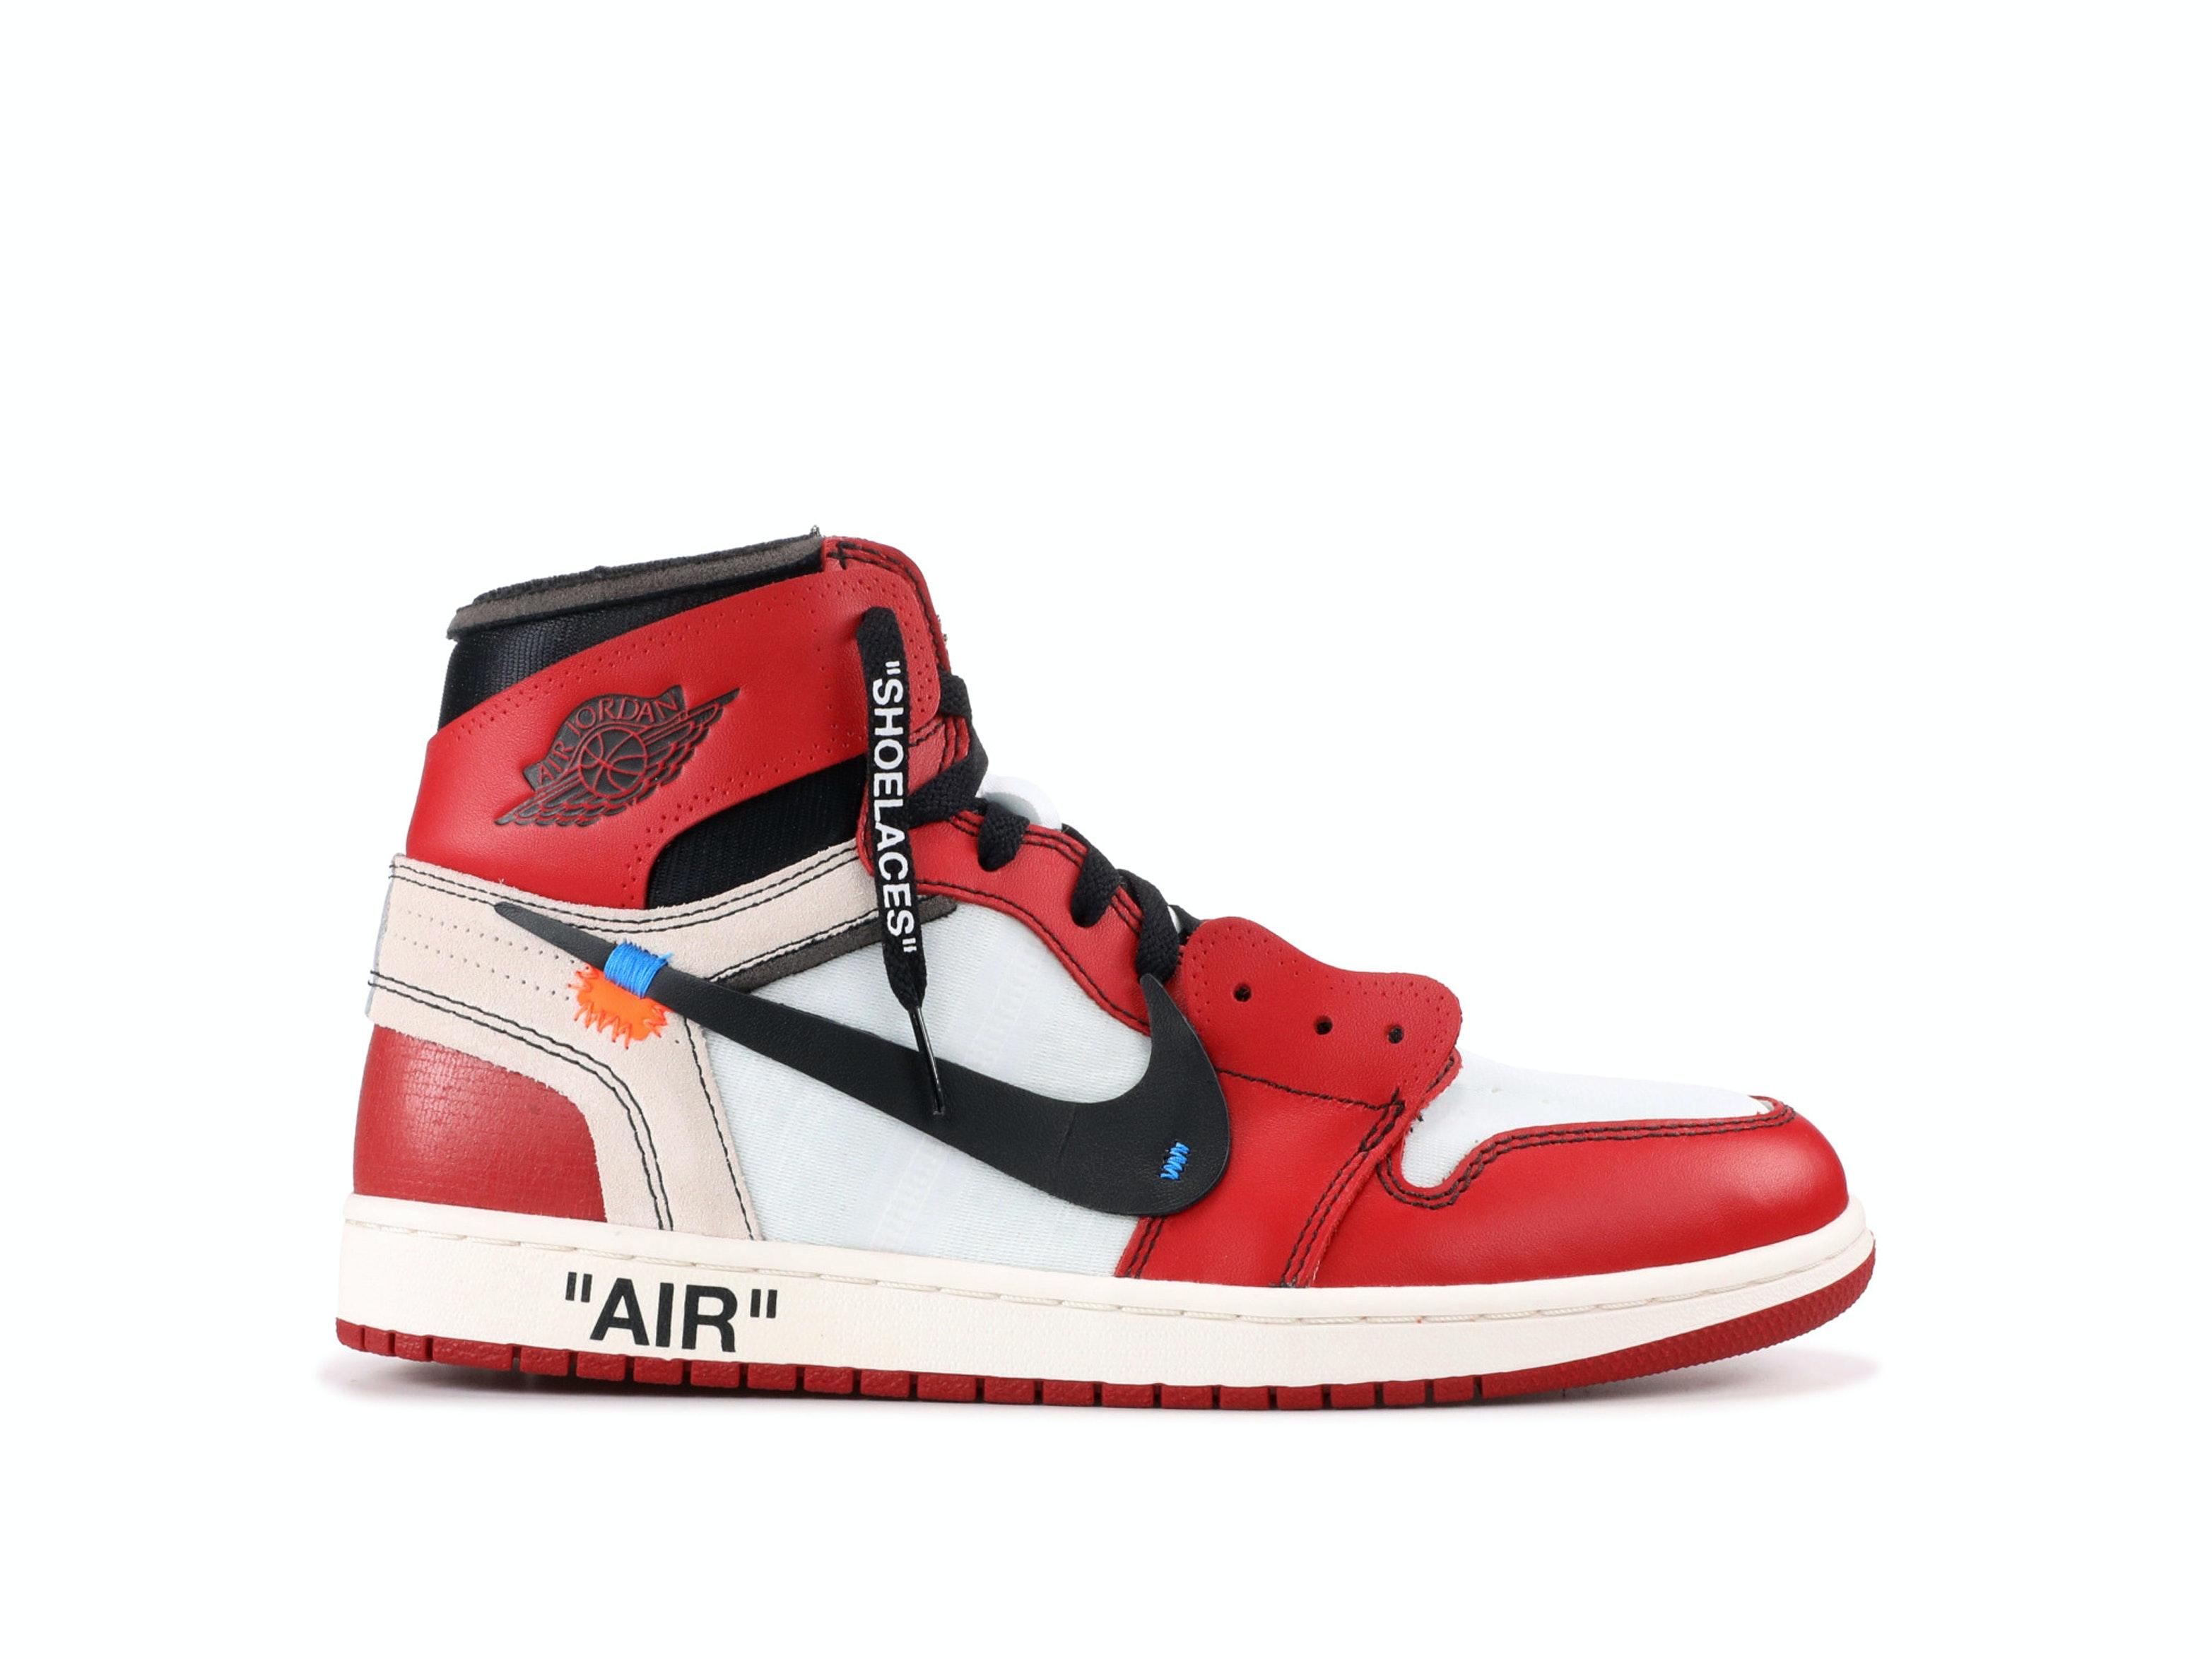 designer fashion fd9ac 74d1c Air Jordan 1 Retro High Chicago x Off-White